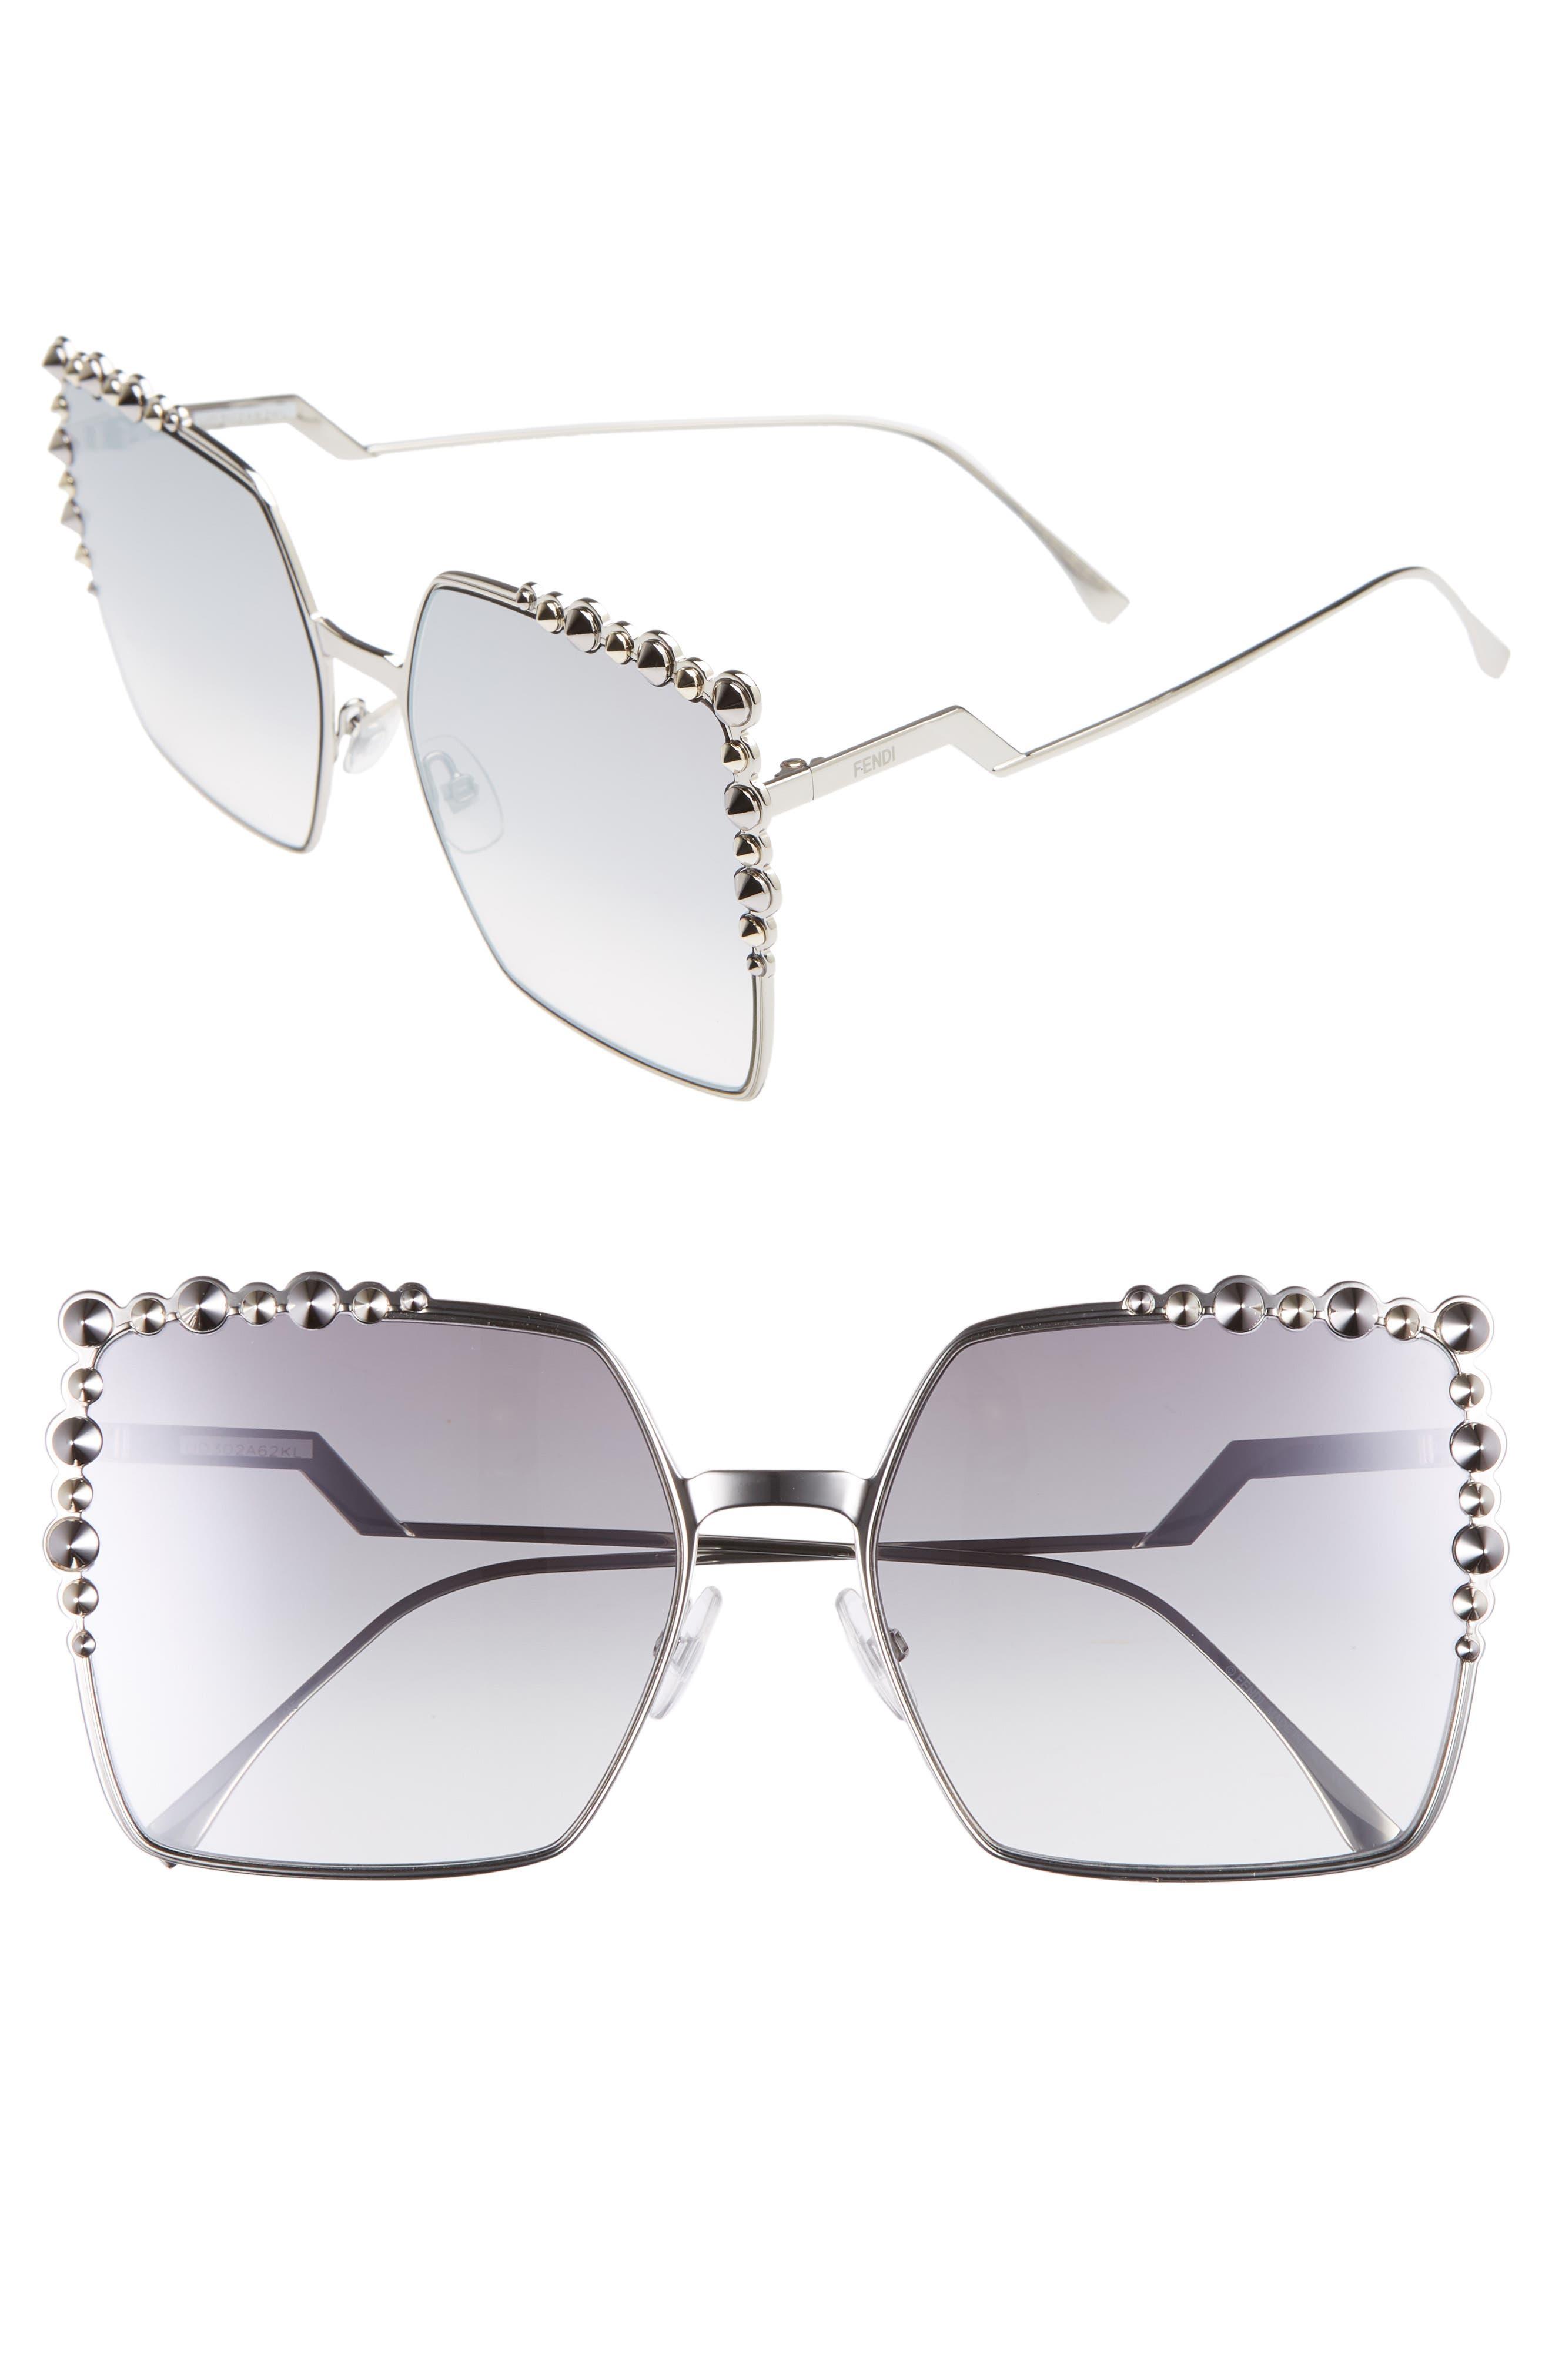 60mm Gradient Square Cat Eye Sunglasses,                             Main thumbnail 1, color,                             043